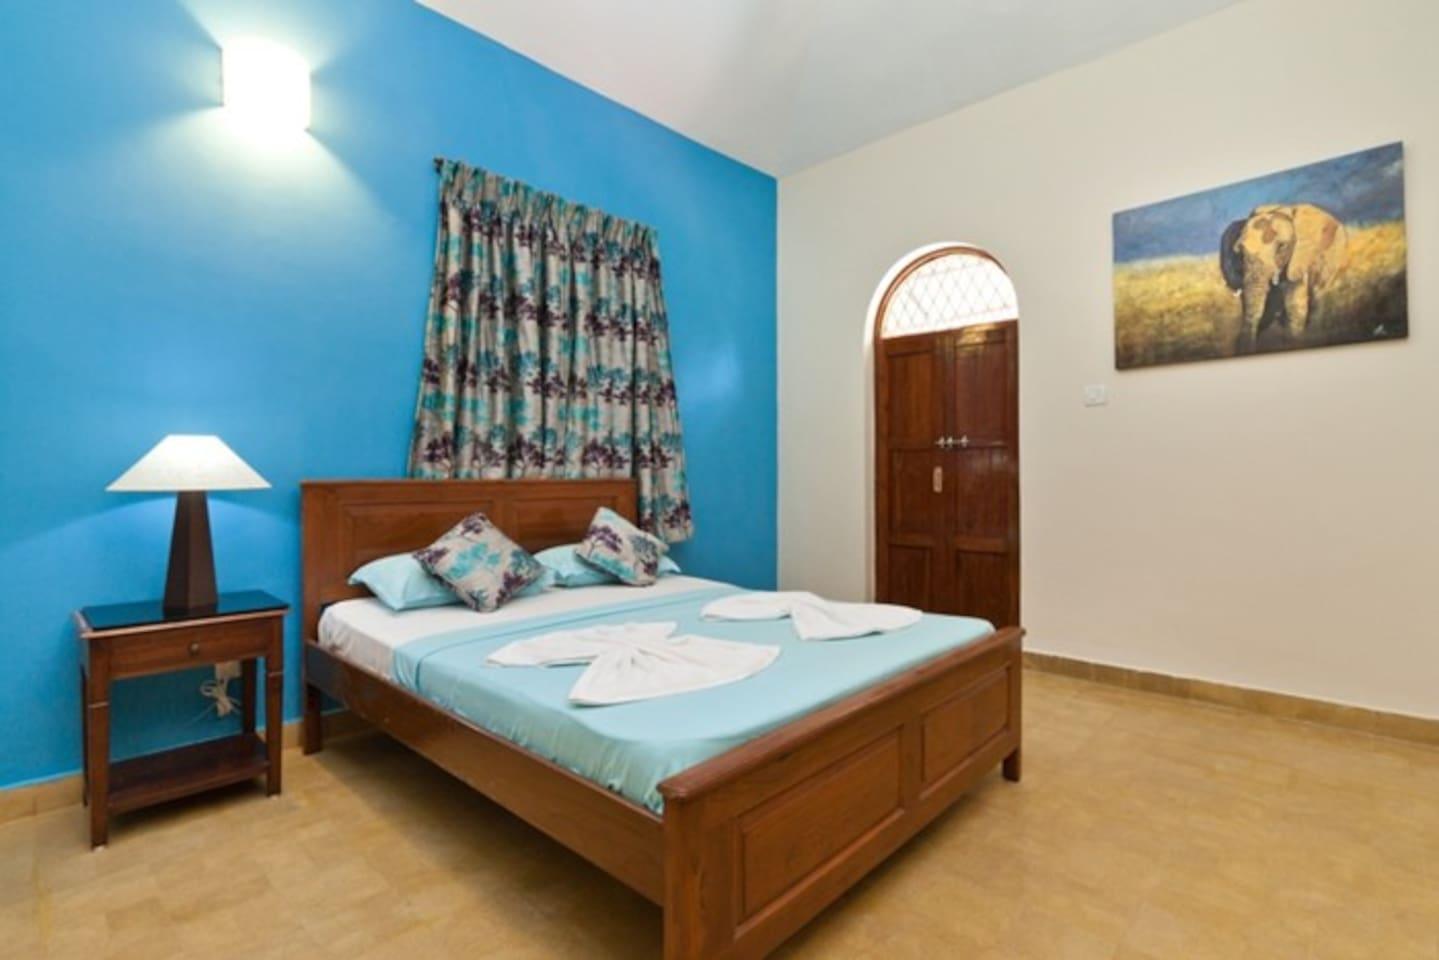 2BHK villa for rent in Calangute